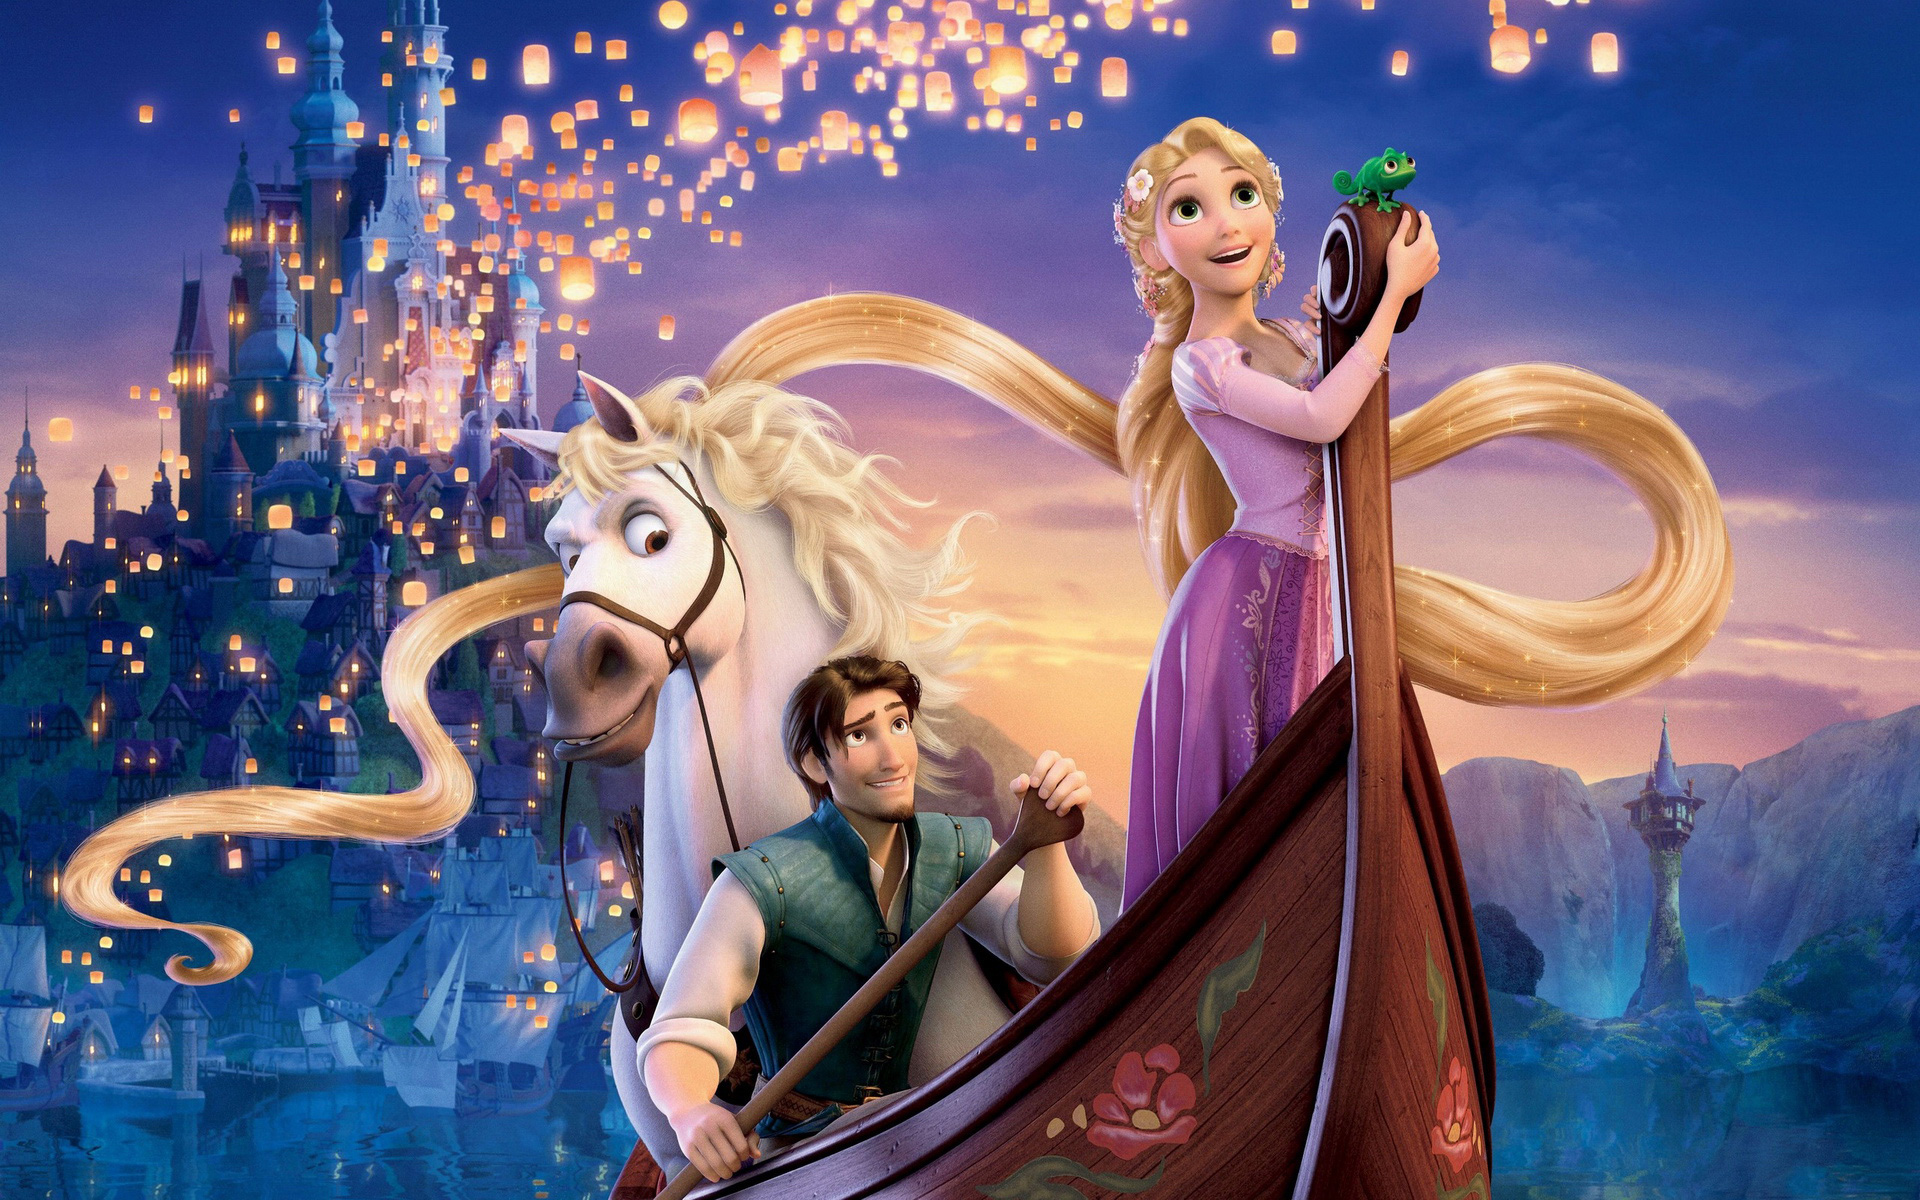 Disney cute princess cartoon wallpaper comics desktop background 1920x1200